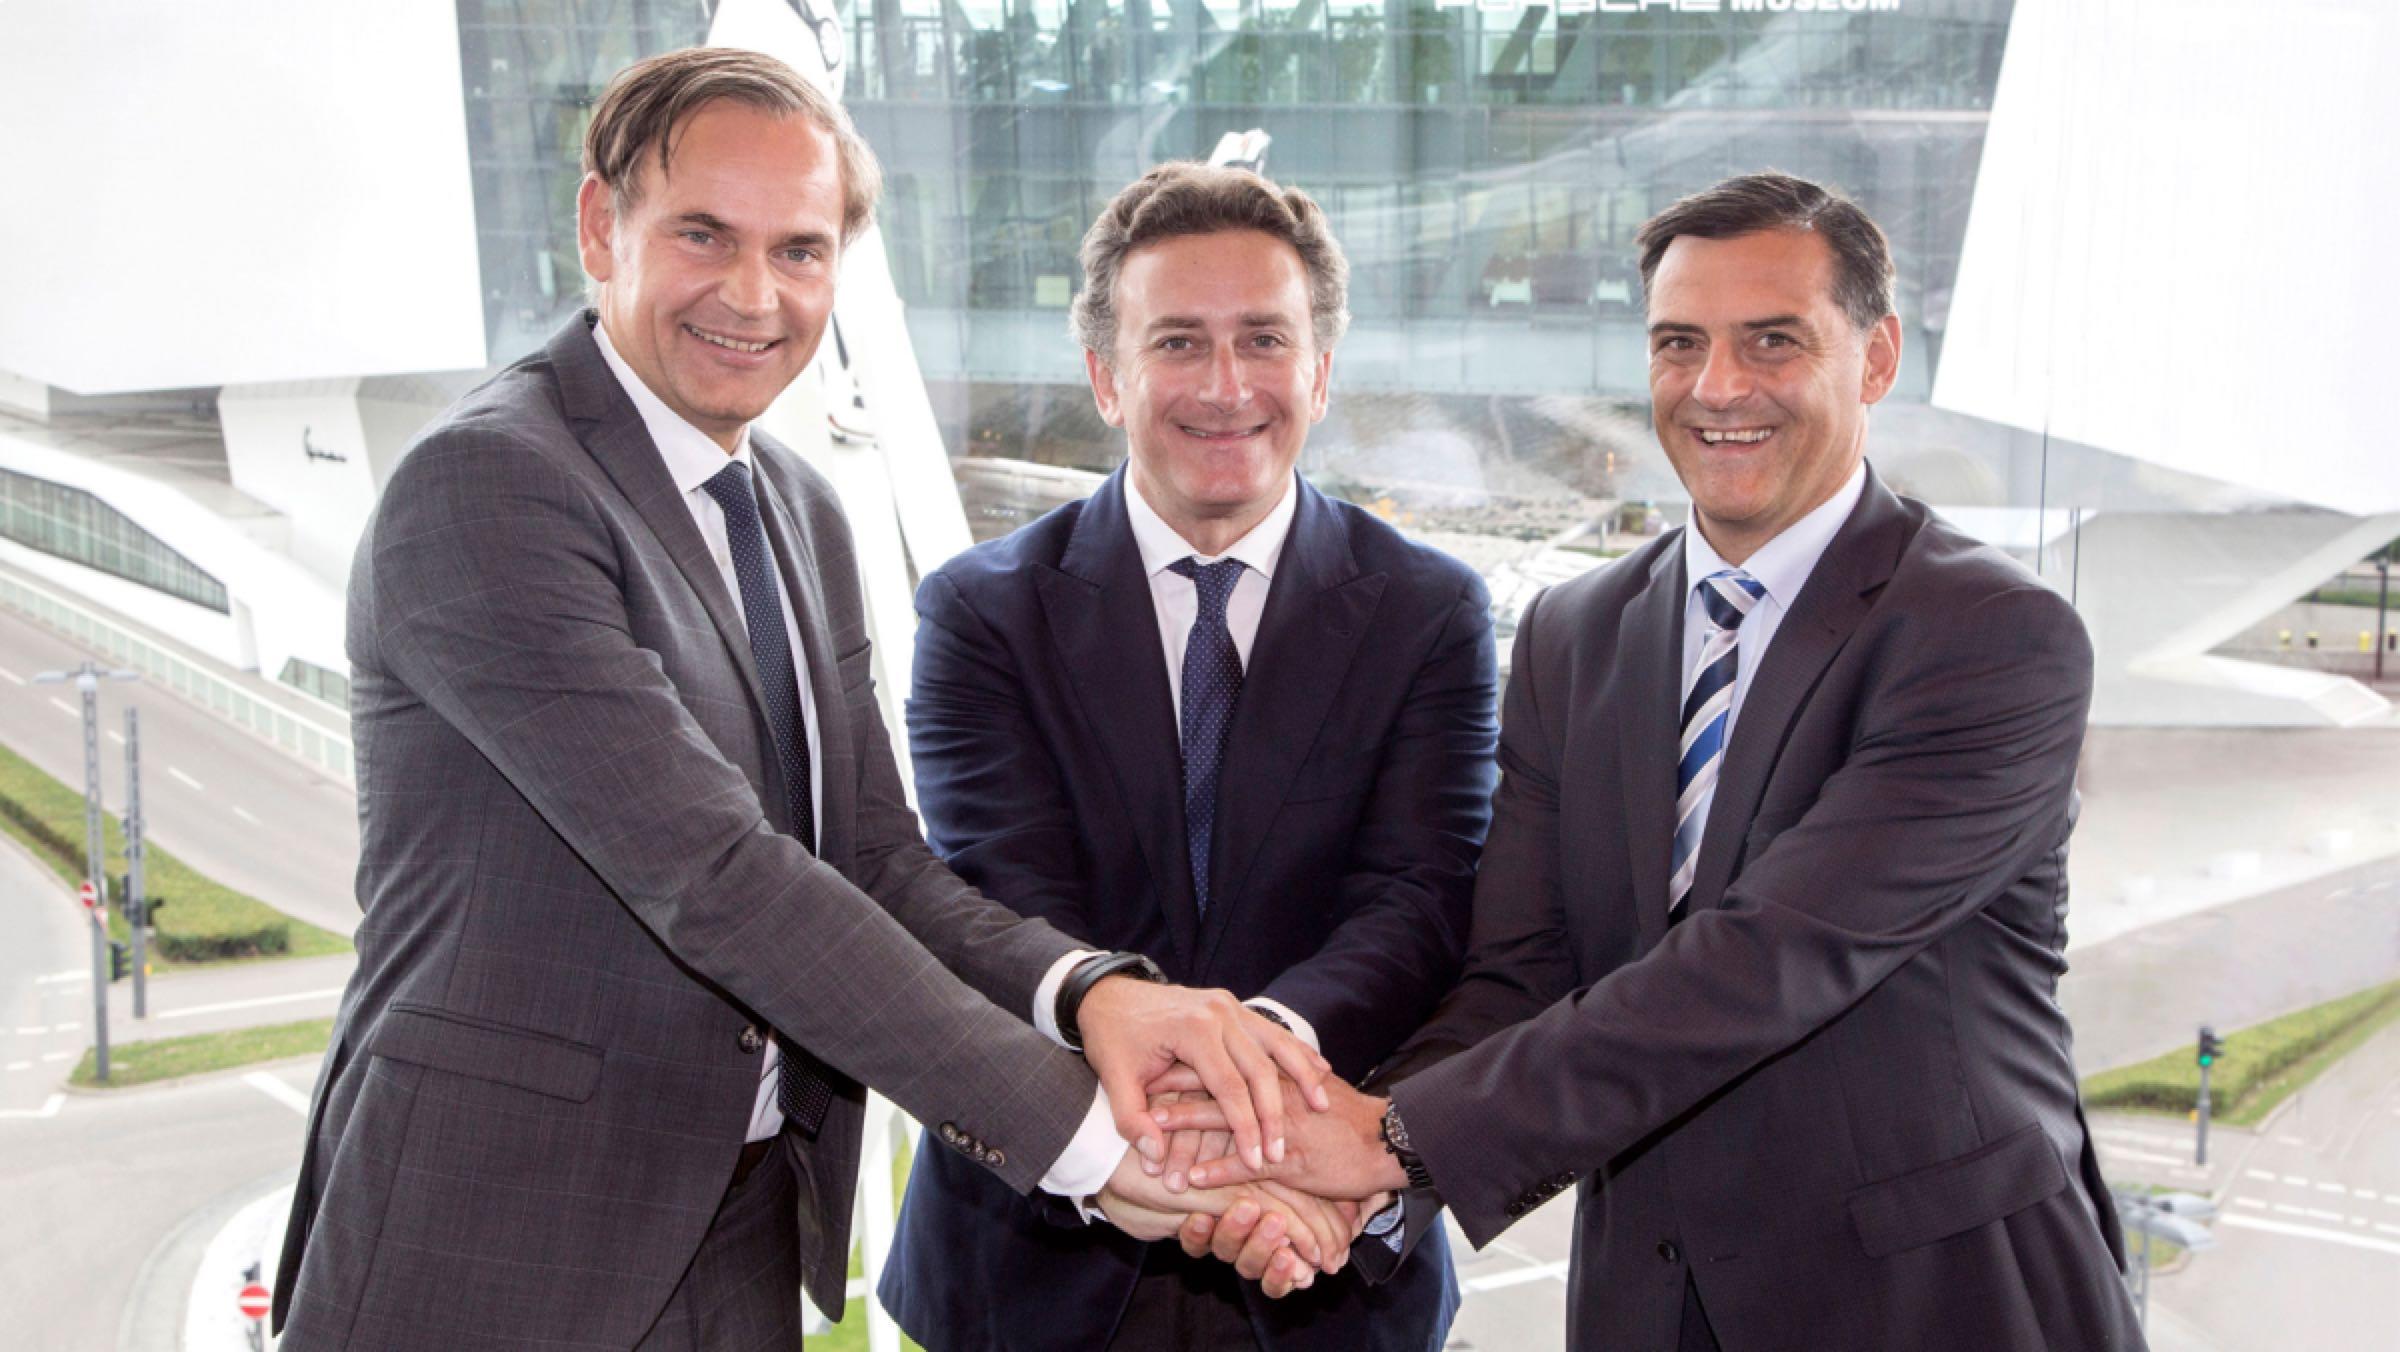 De izquierda a derecha, Oliver Blume, CEO de Porsche, Alejandro Agag, CEO de la Fórmula E y Michael Steiner, miembro ejecutivo de I+D de Porsche